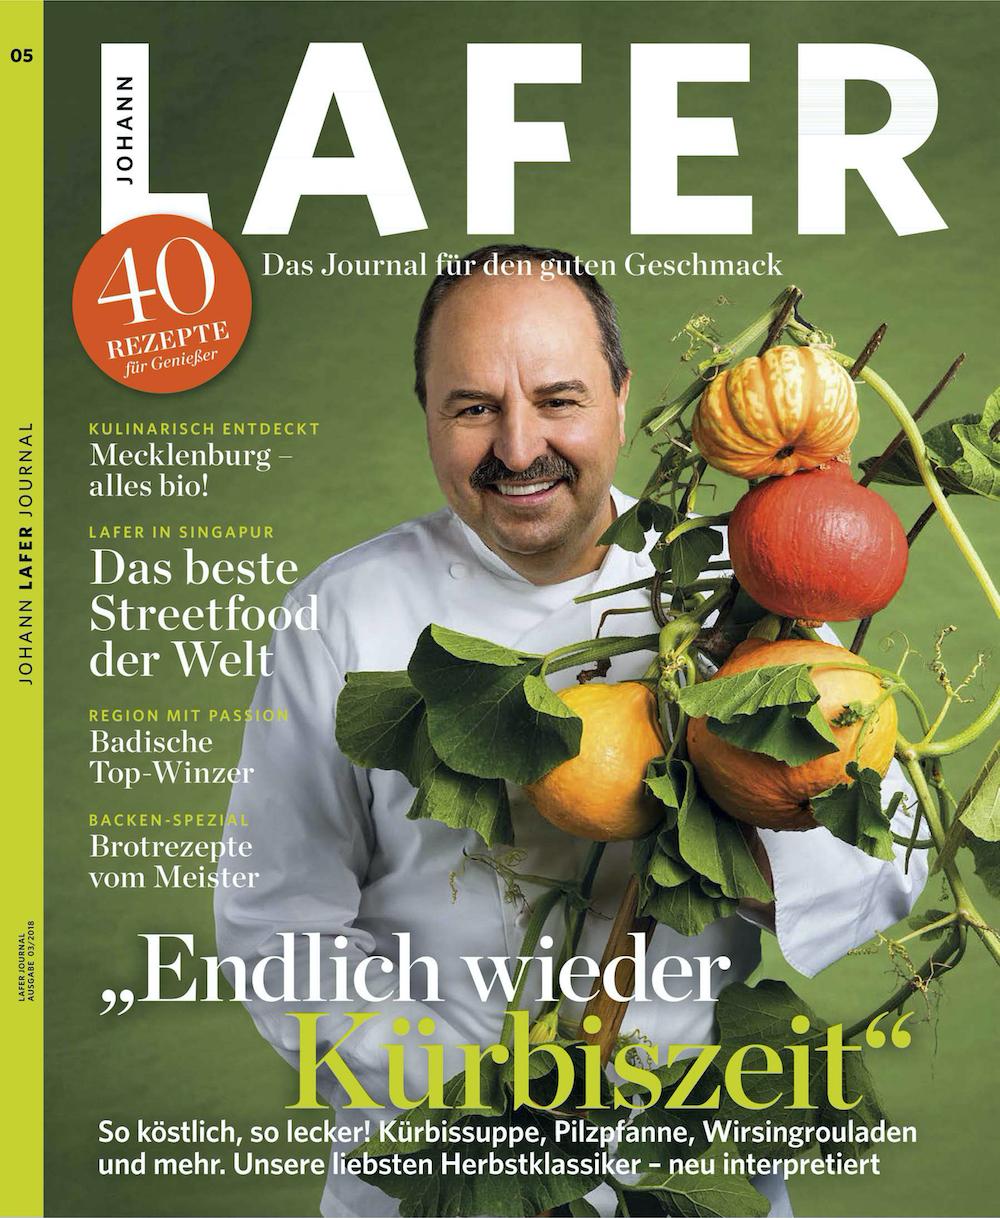 Johann Lafer 2018-05